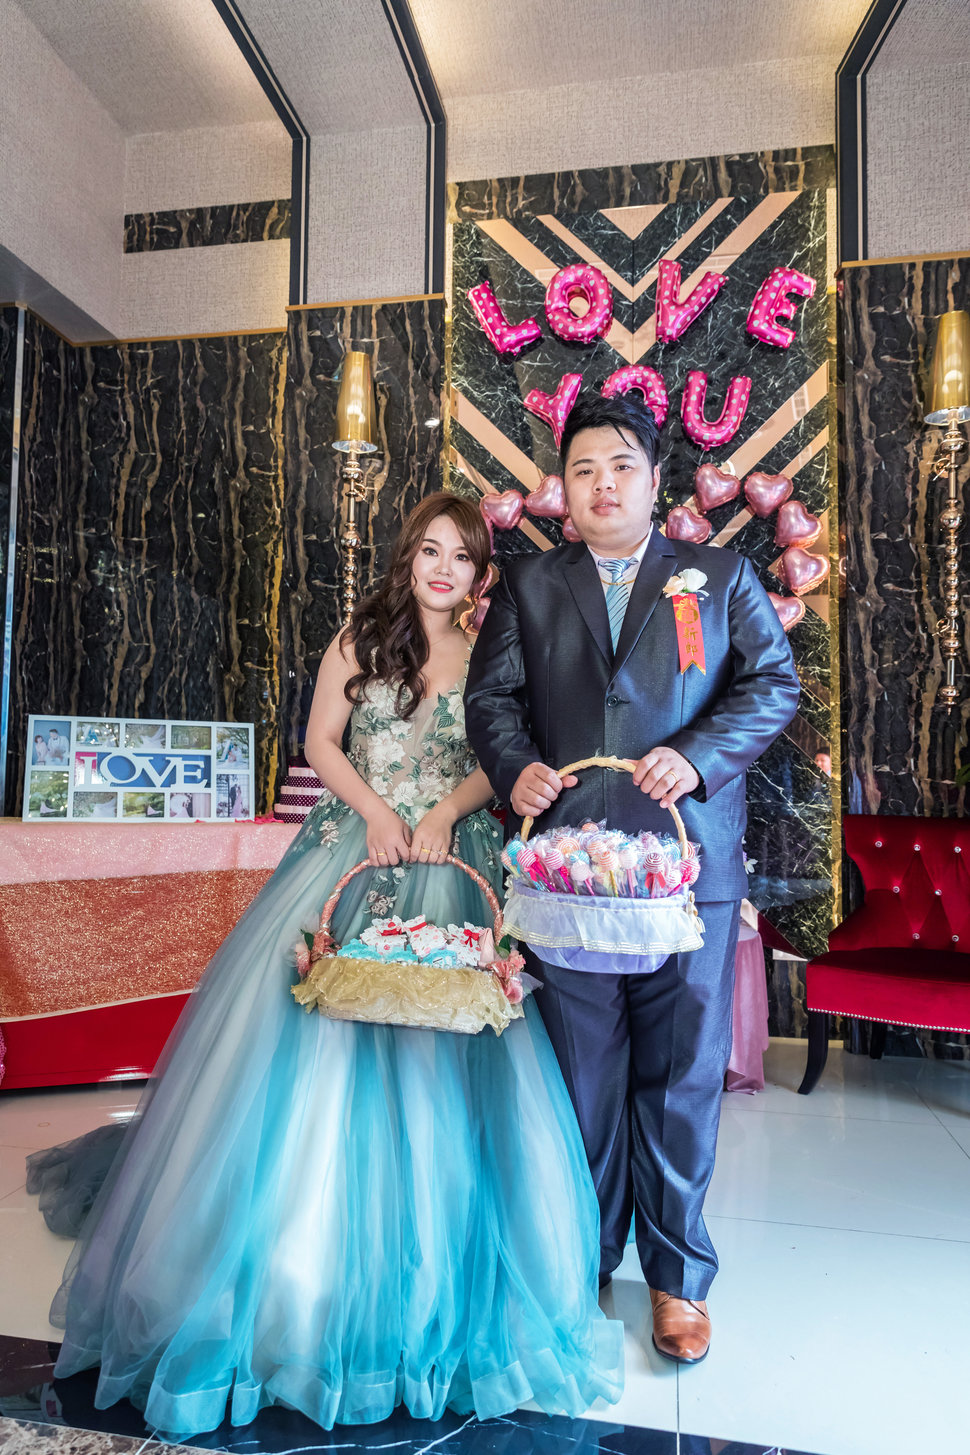 5D4_0940 - Promaker婚禮紀錄攝影團隊婚攝豪哥《結婚吧》